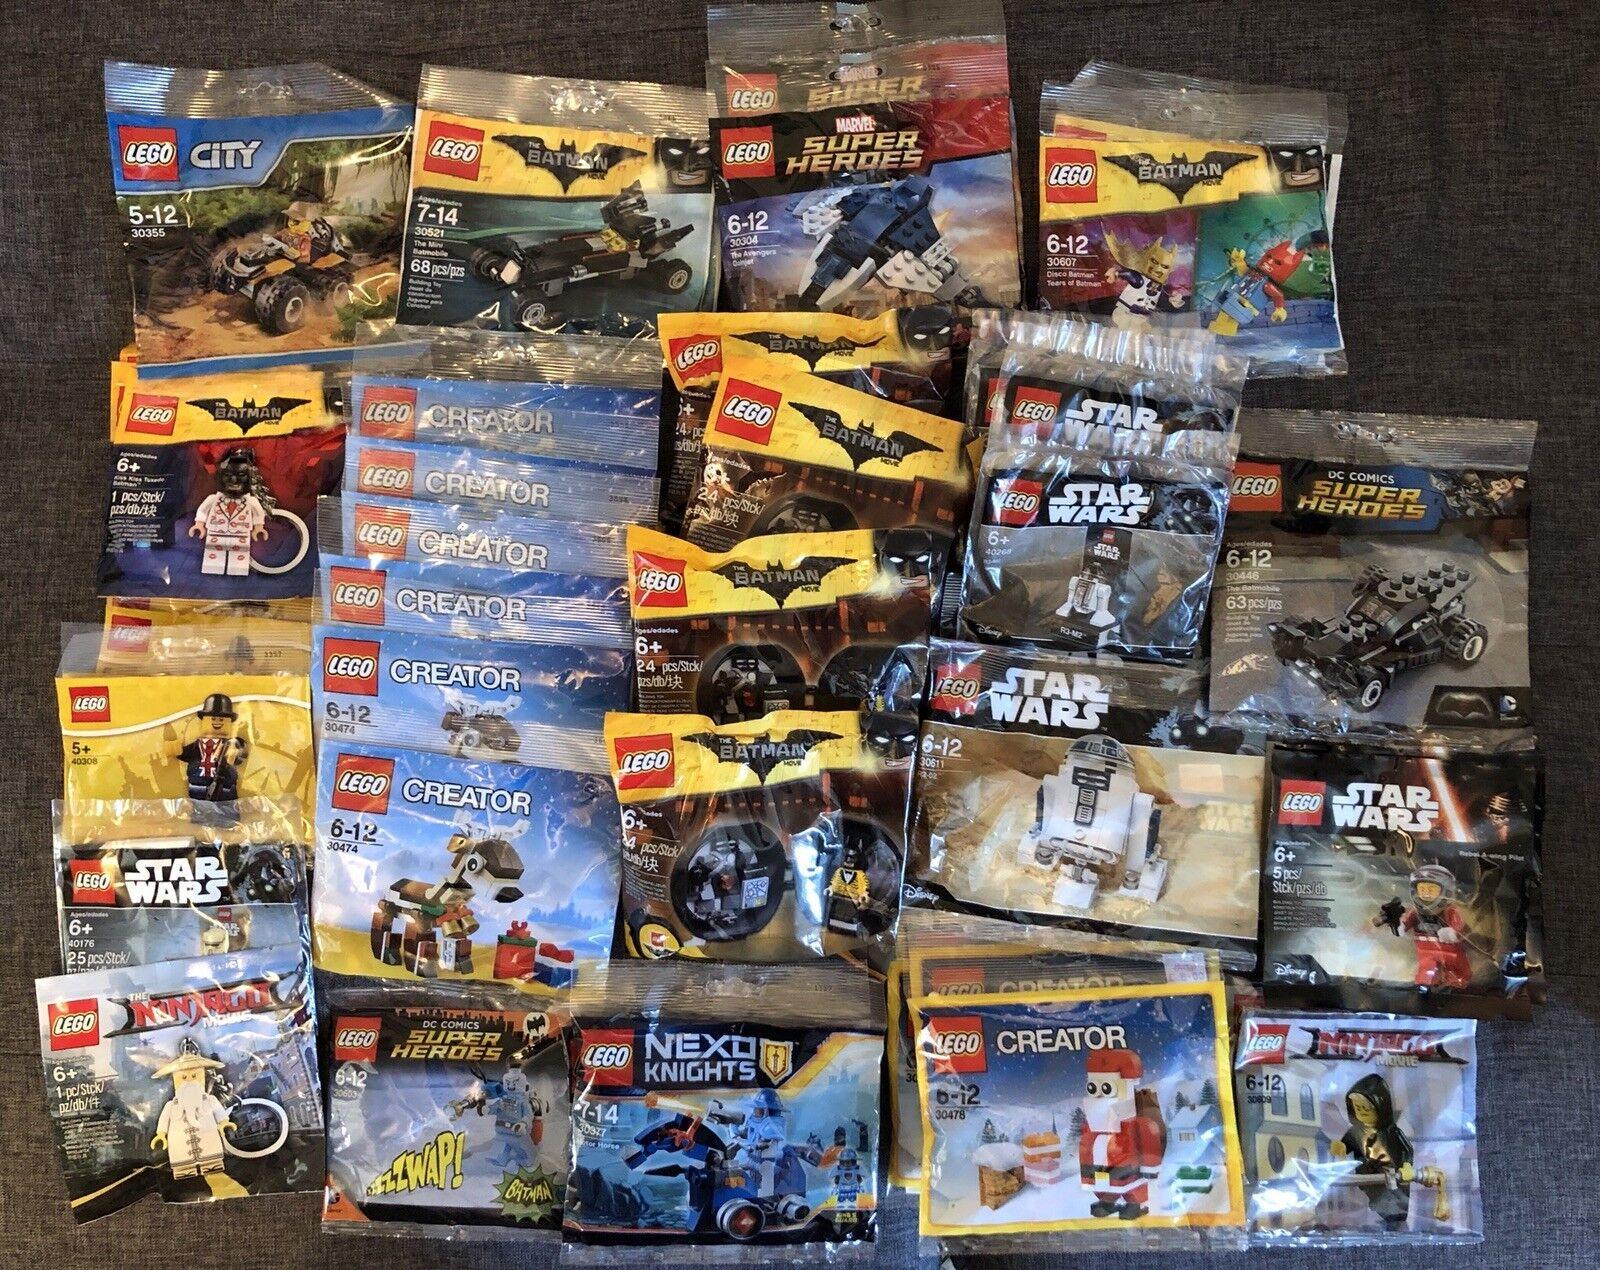 48 48 48 x Lego Polybag Bundle Star Wars Ninjago Christmas Batman Creator Super Heroes 7f2413